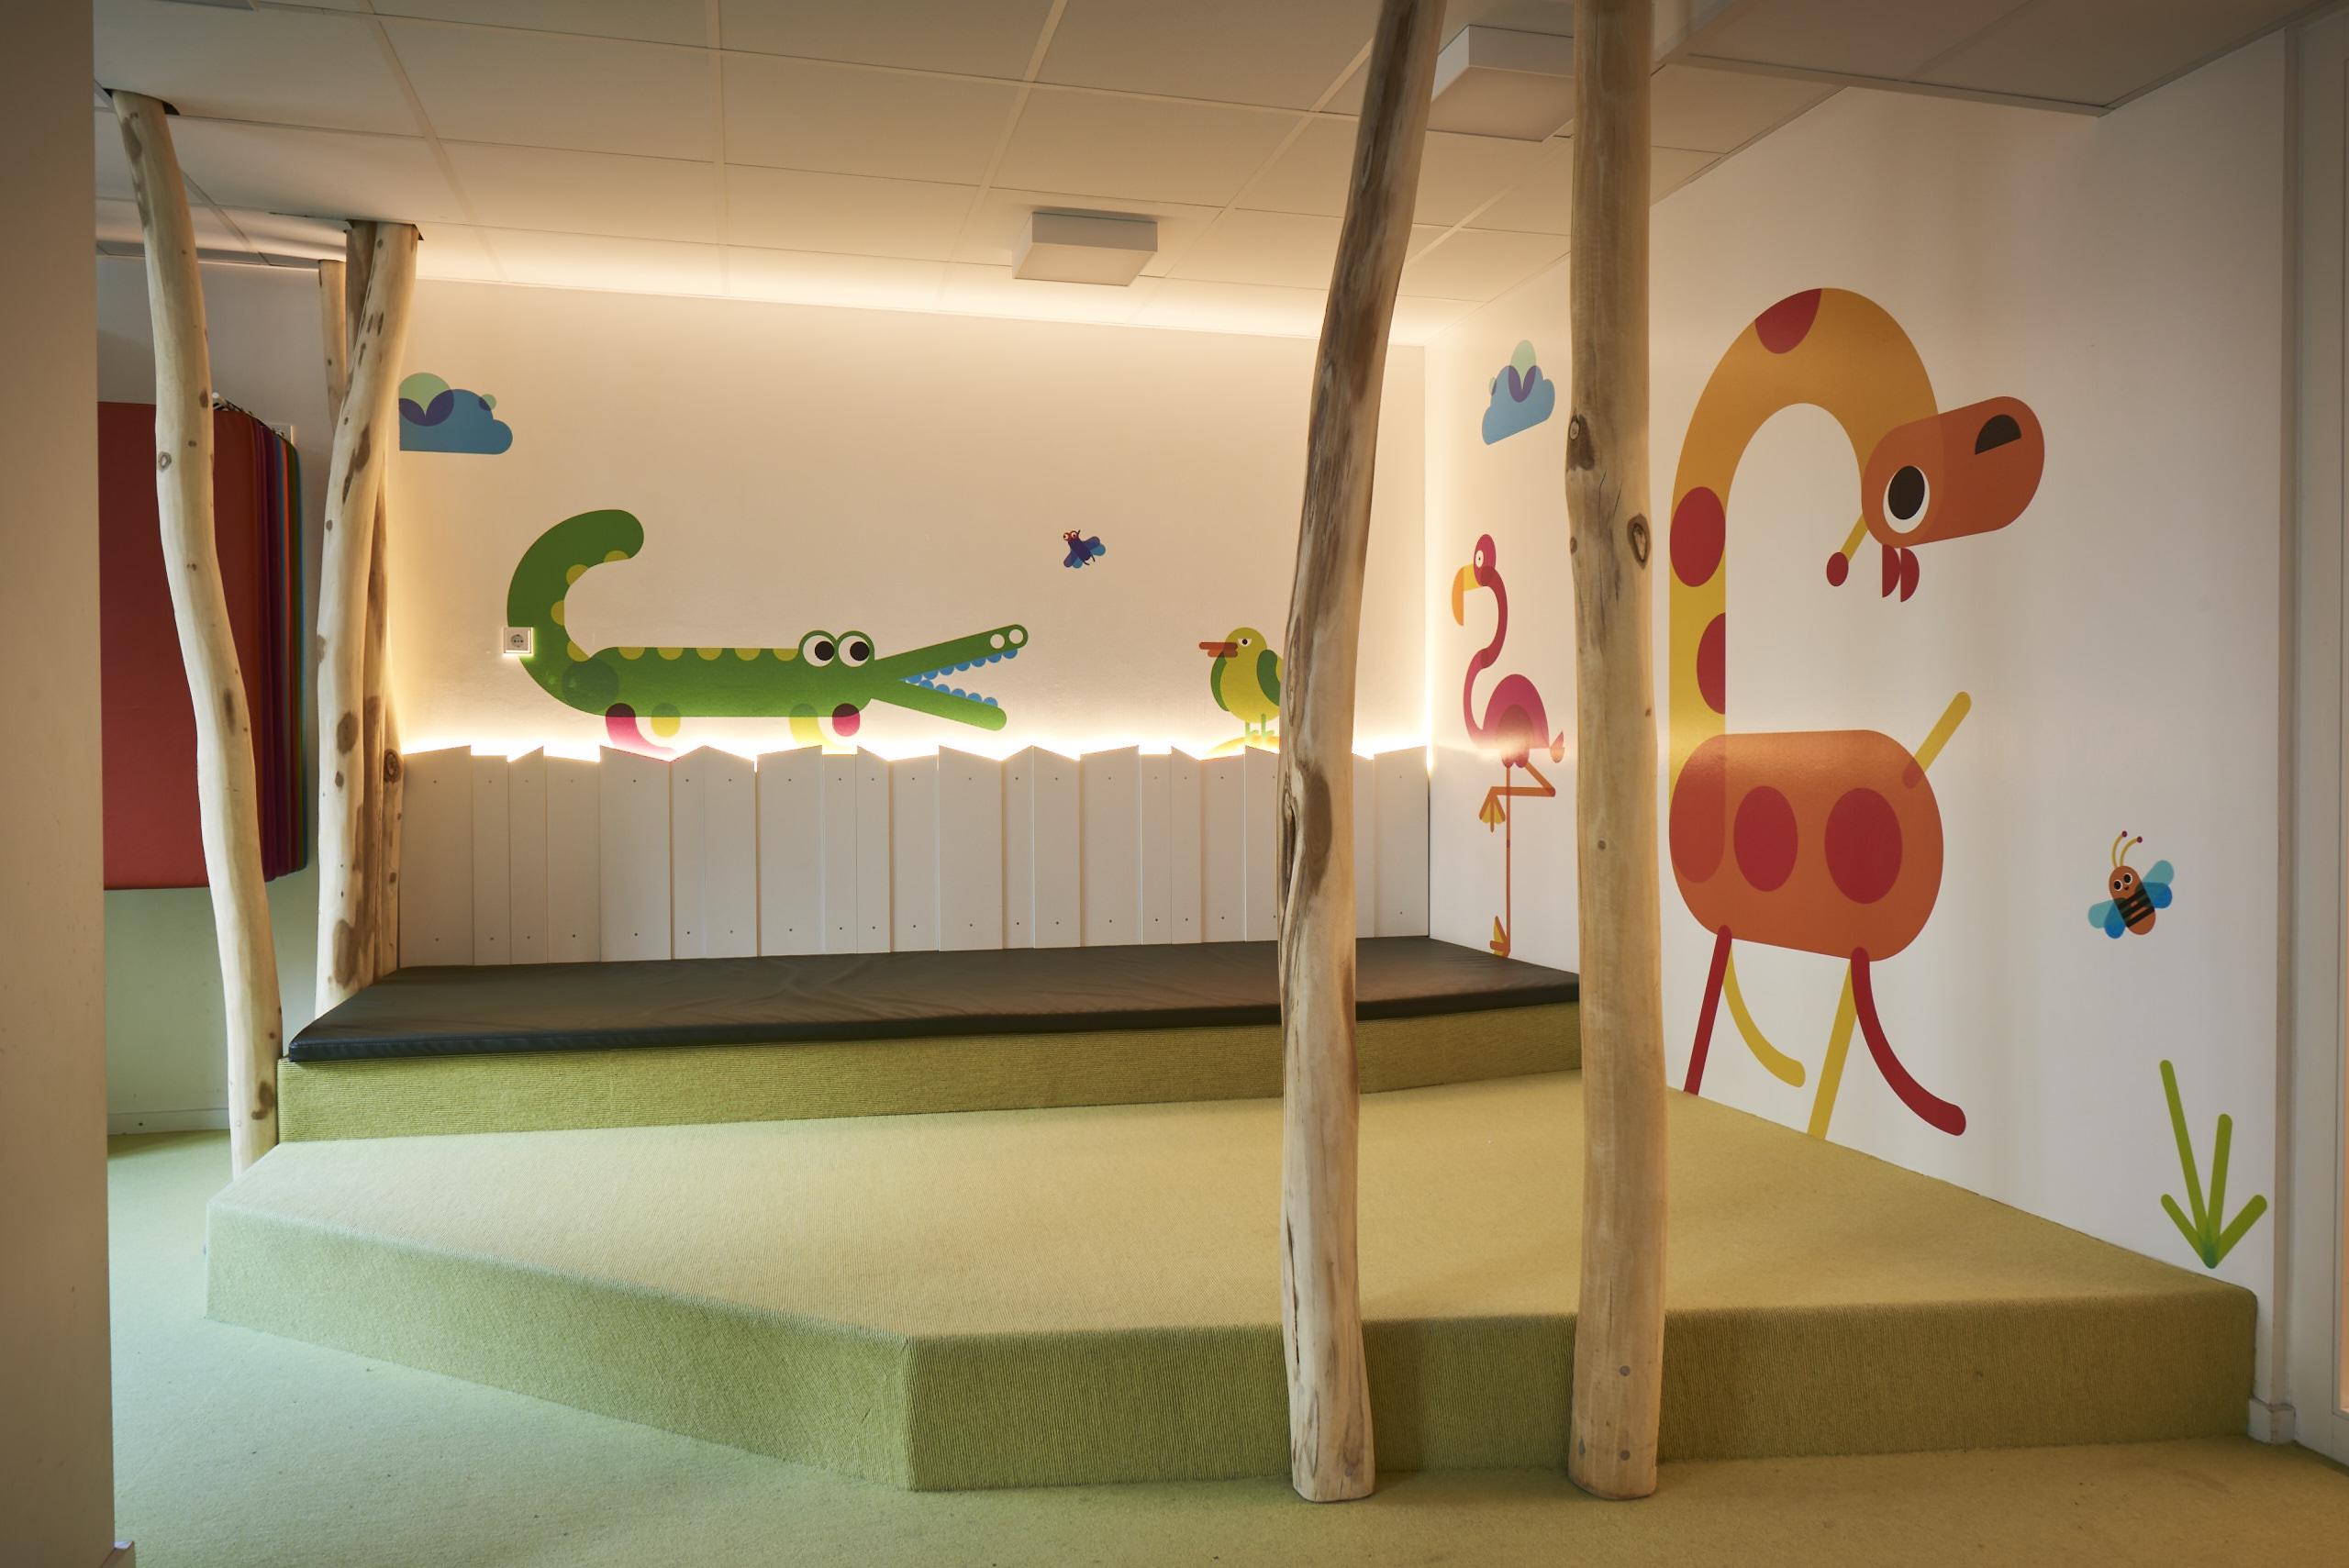 Kita Kinderzimmer Lohsepark Hafencity in 20457, Hamburg